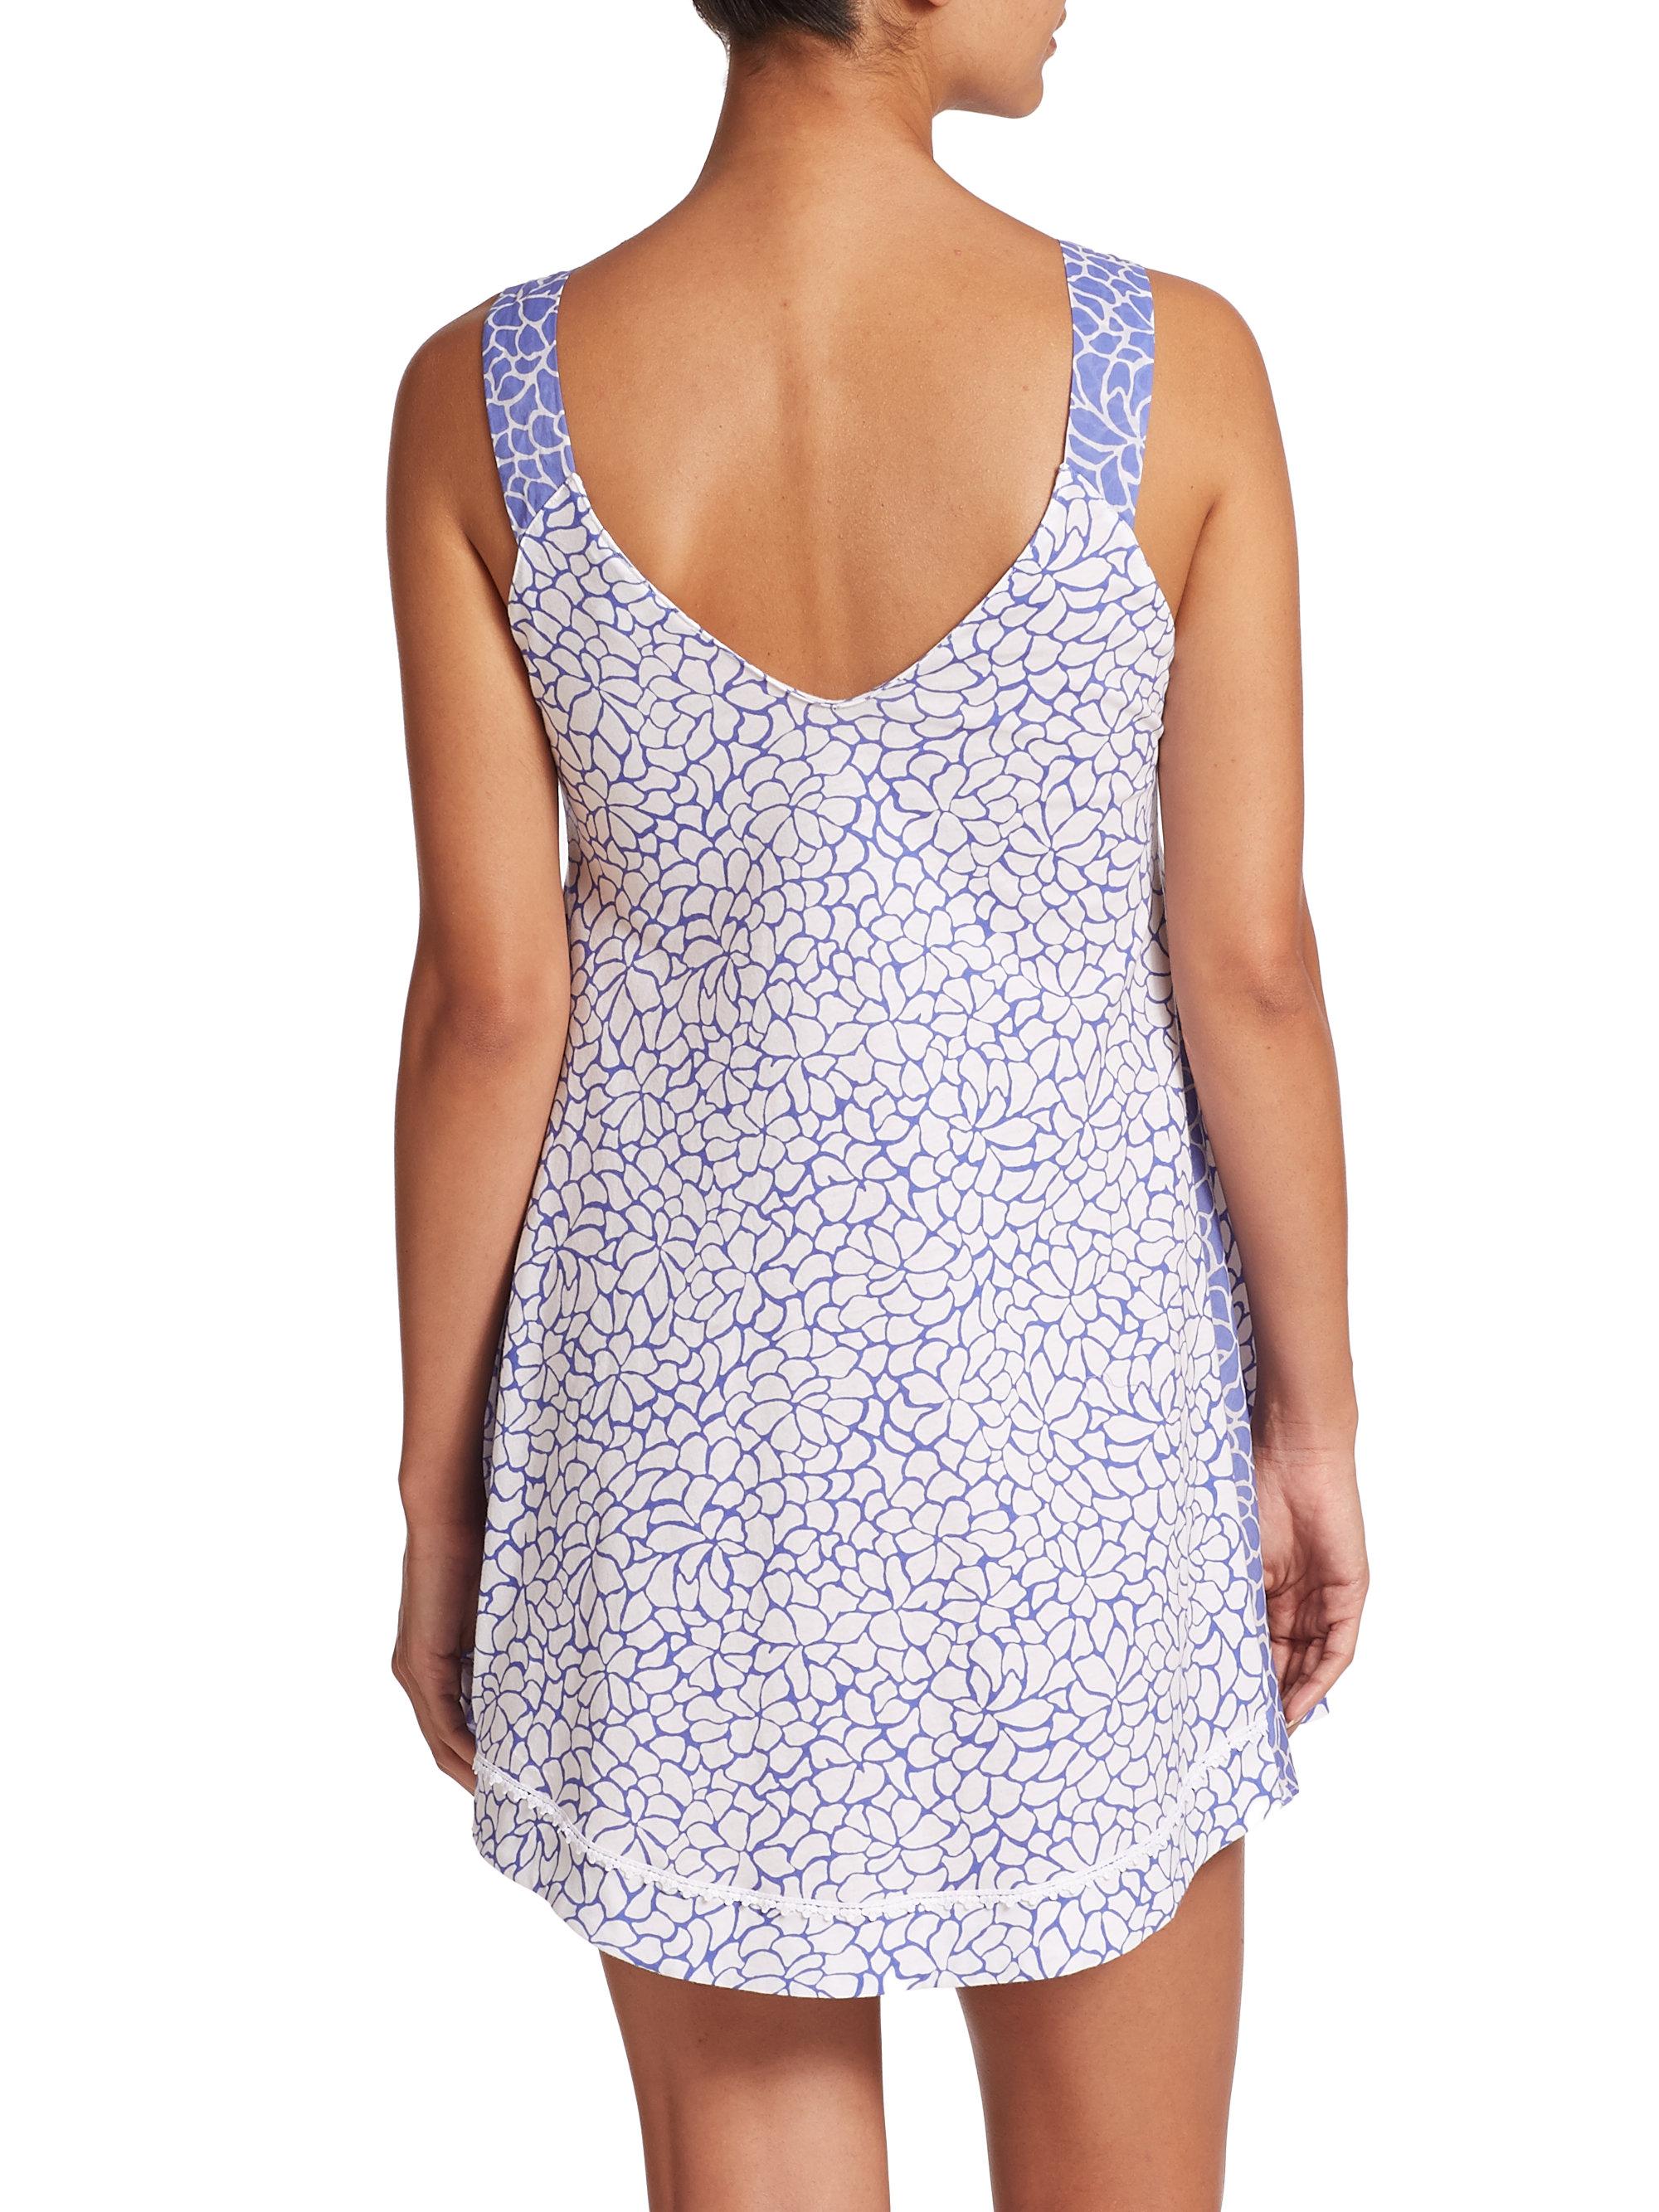 White Cotton Jersey Nightgowns La Cera Women S Embroidered